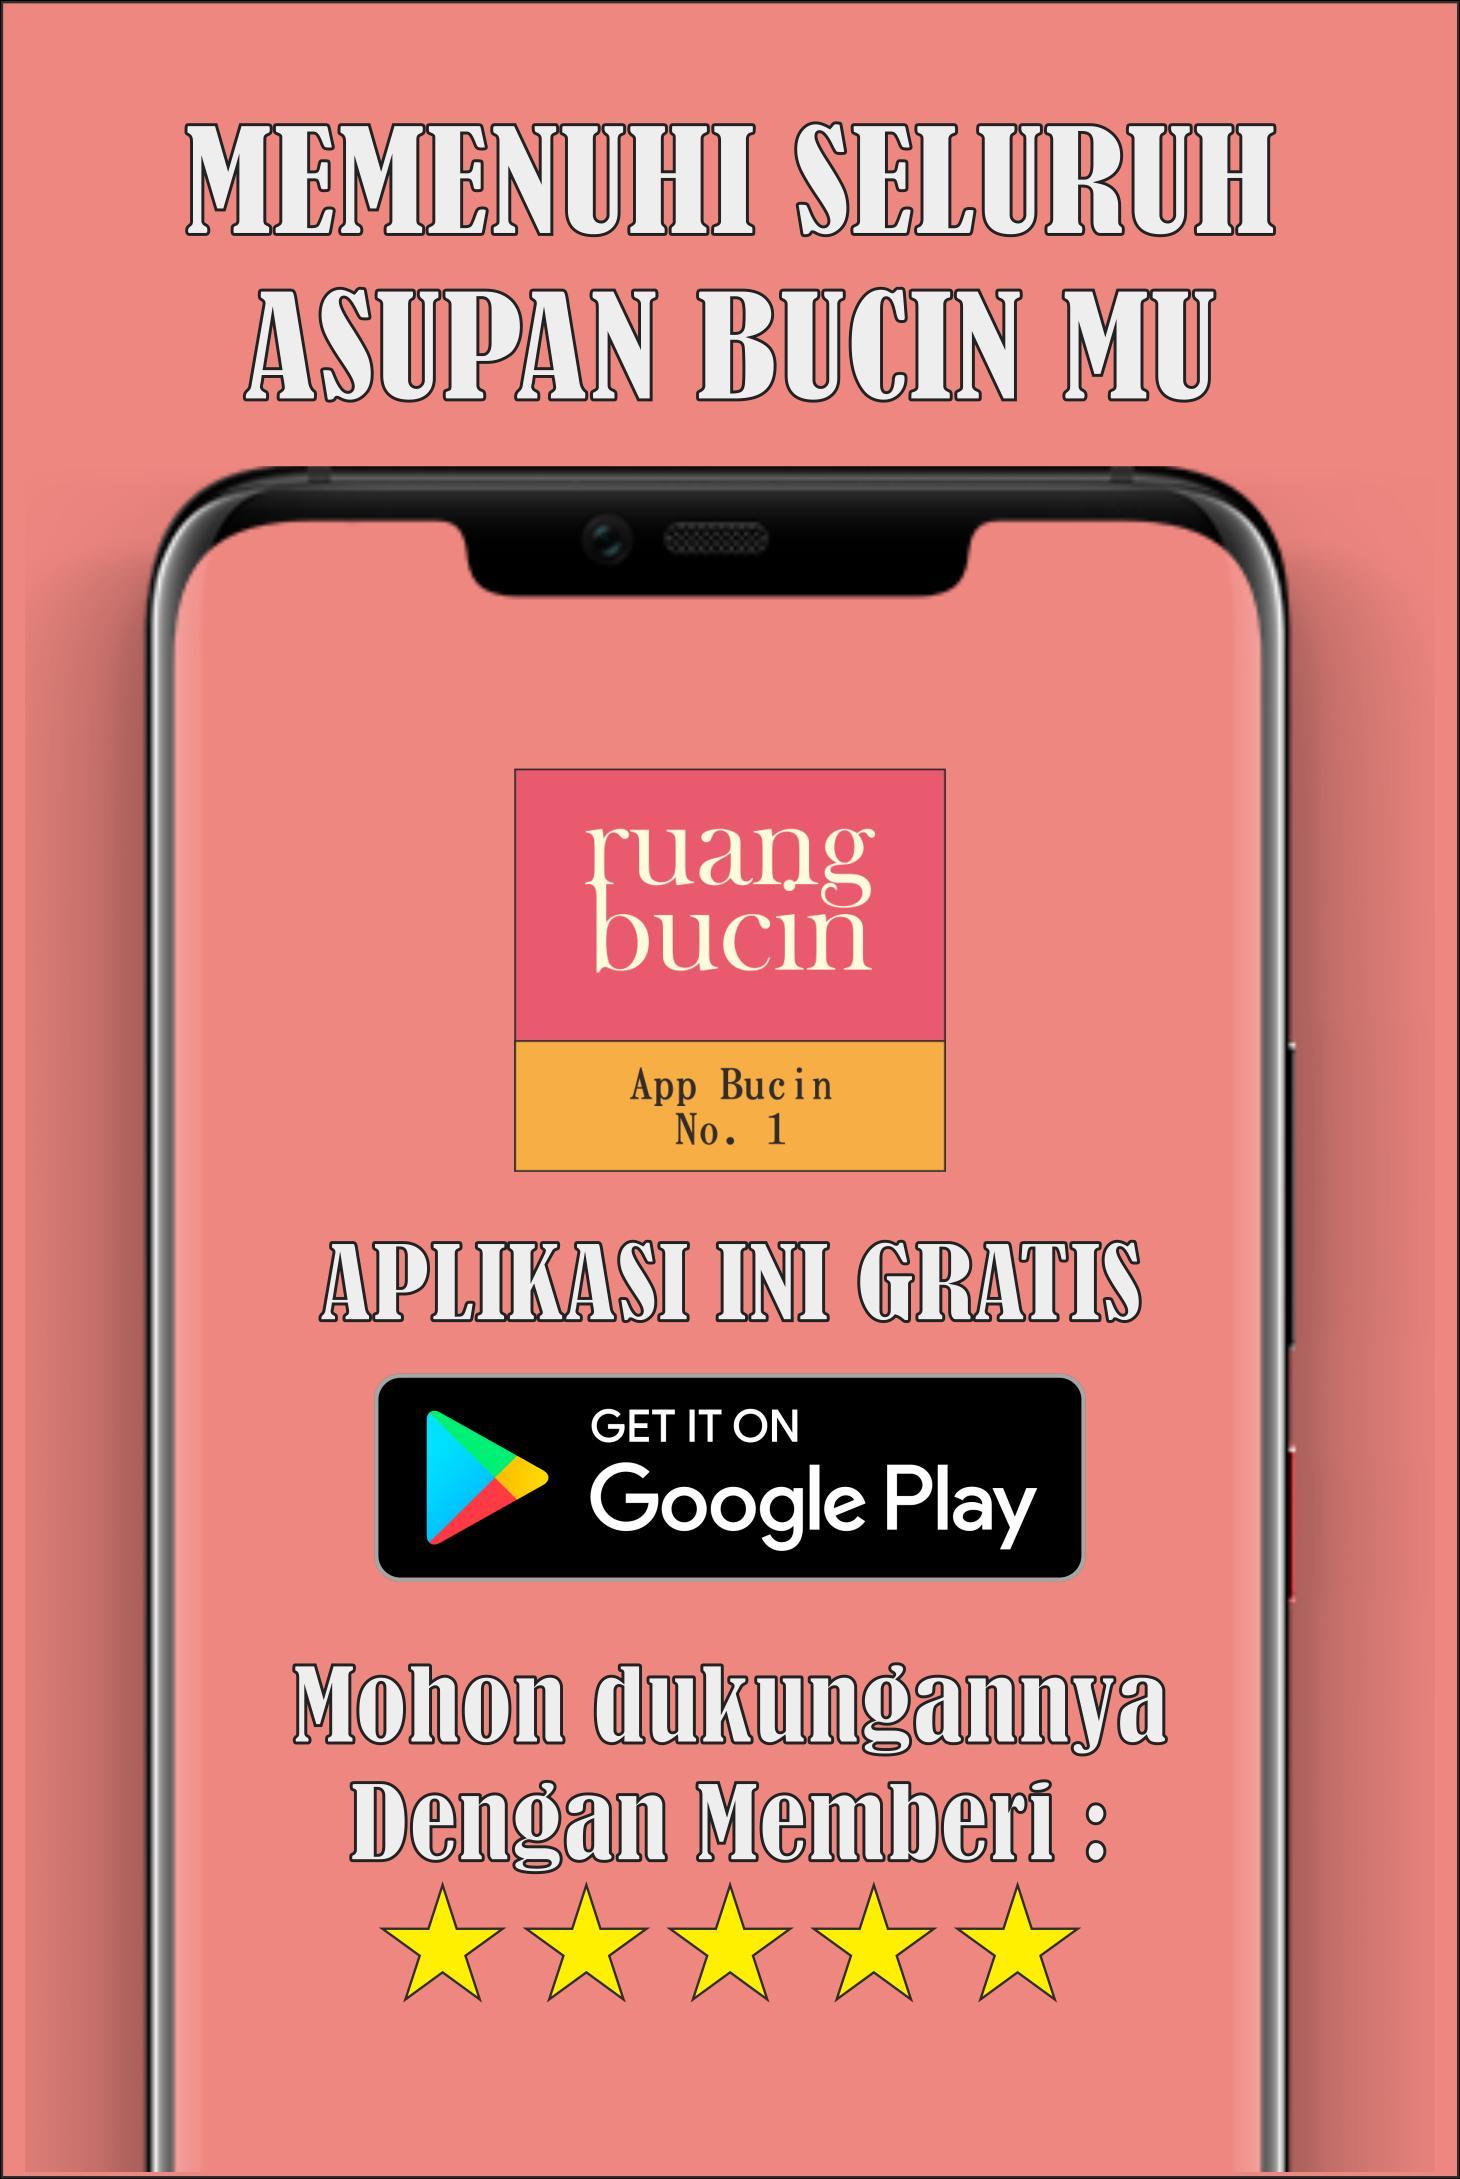 Kata Gombal Dan Gombalan Maut Romantis For Android Apk